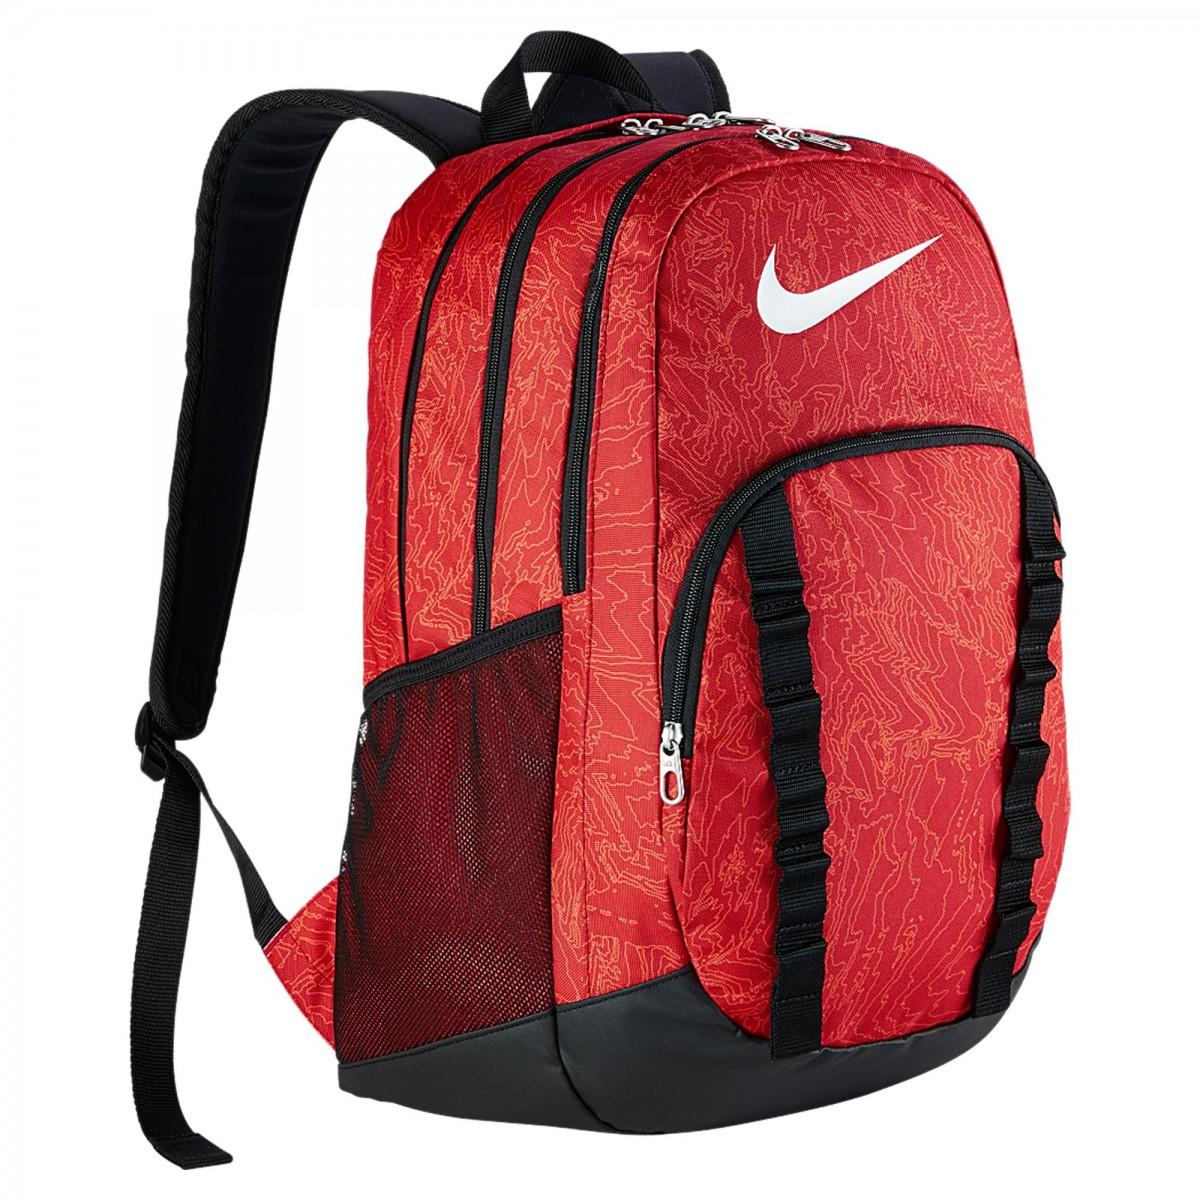 b7084034b Mochila Nike Brasilia 7 Backpack Graphi